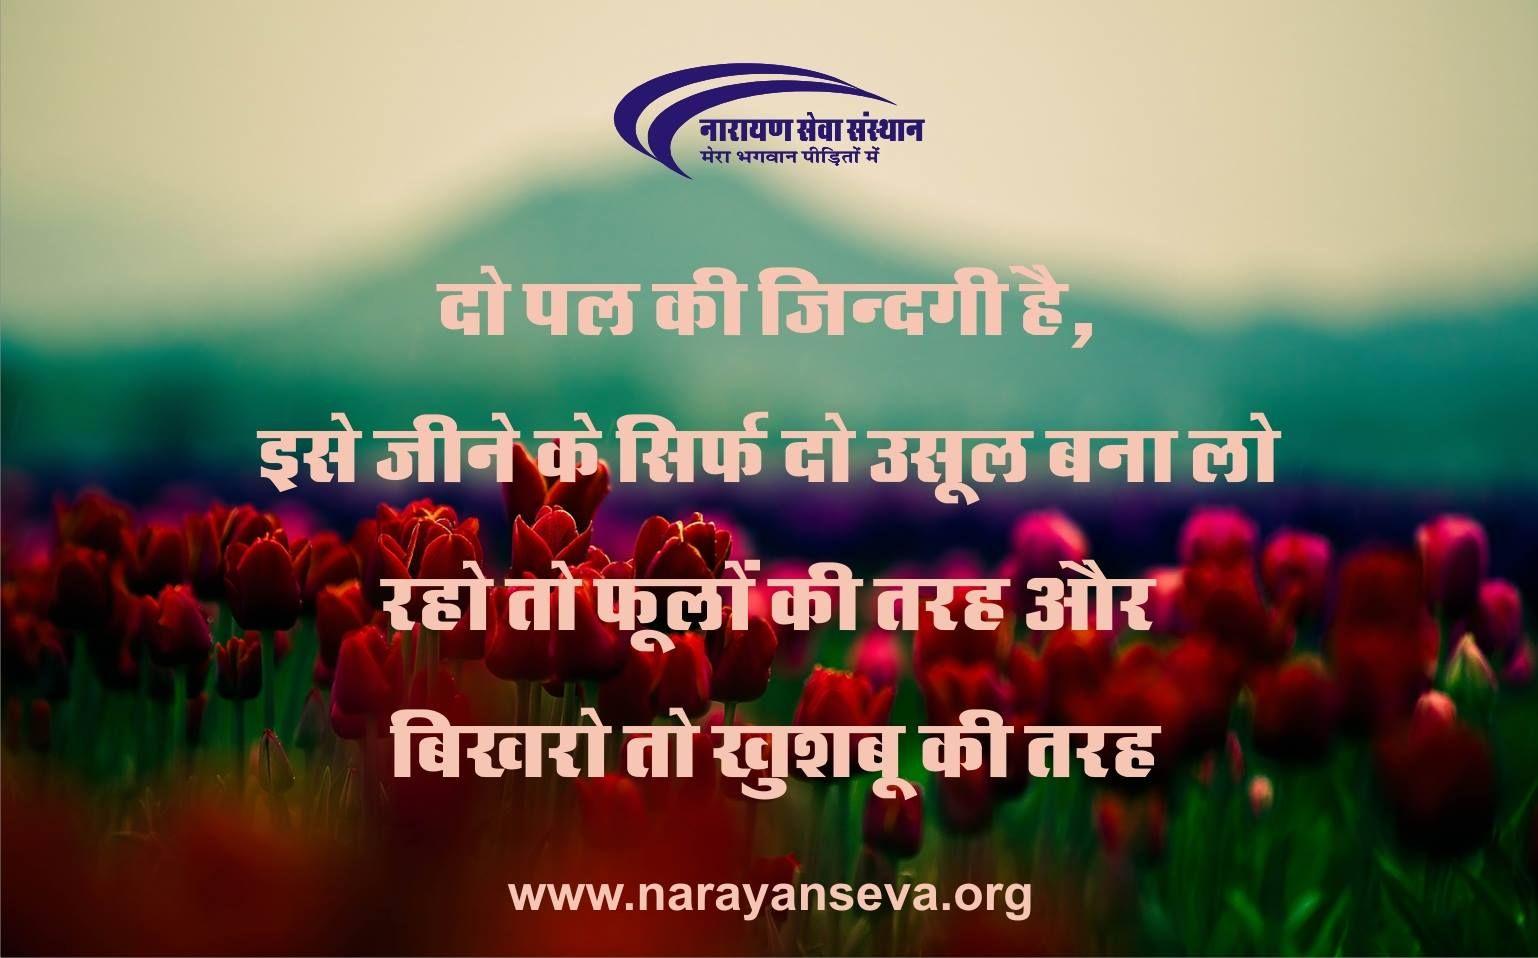 #DailyQuote #Quoteoftheday #motivational #quote #InspirationalQuote #GoodMorning #HappySunday www.narayanseva.org